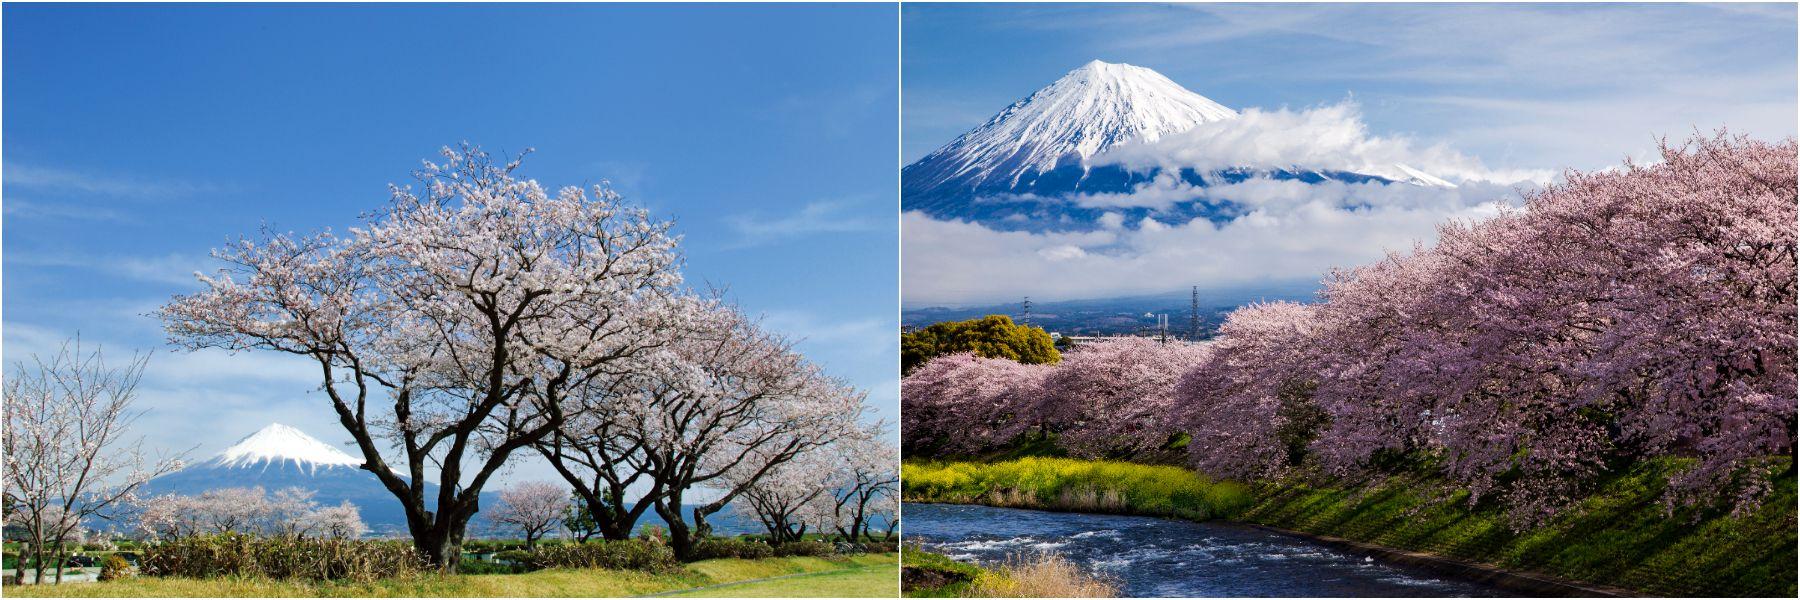 Do not miss this combination of Mt. Fuji's reflection and Yoshino Cherry Trees! - Tanuki Lake (Shizuoka)